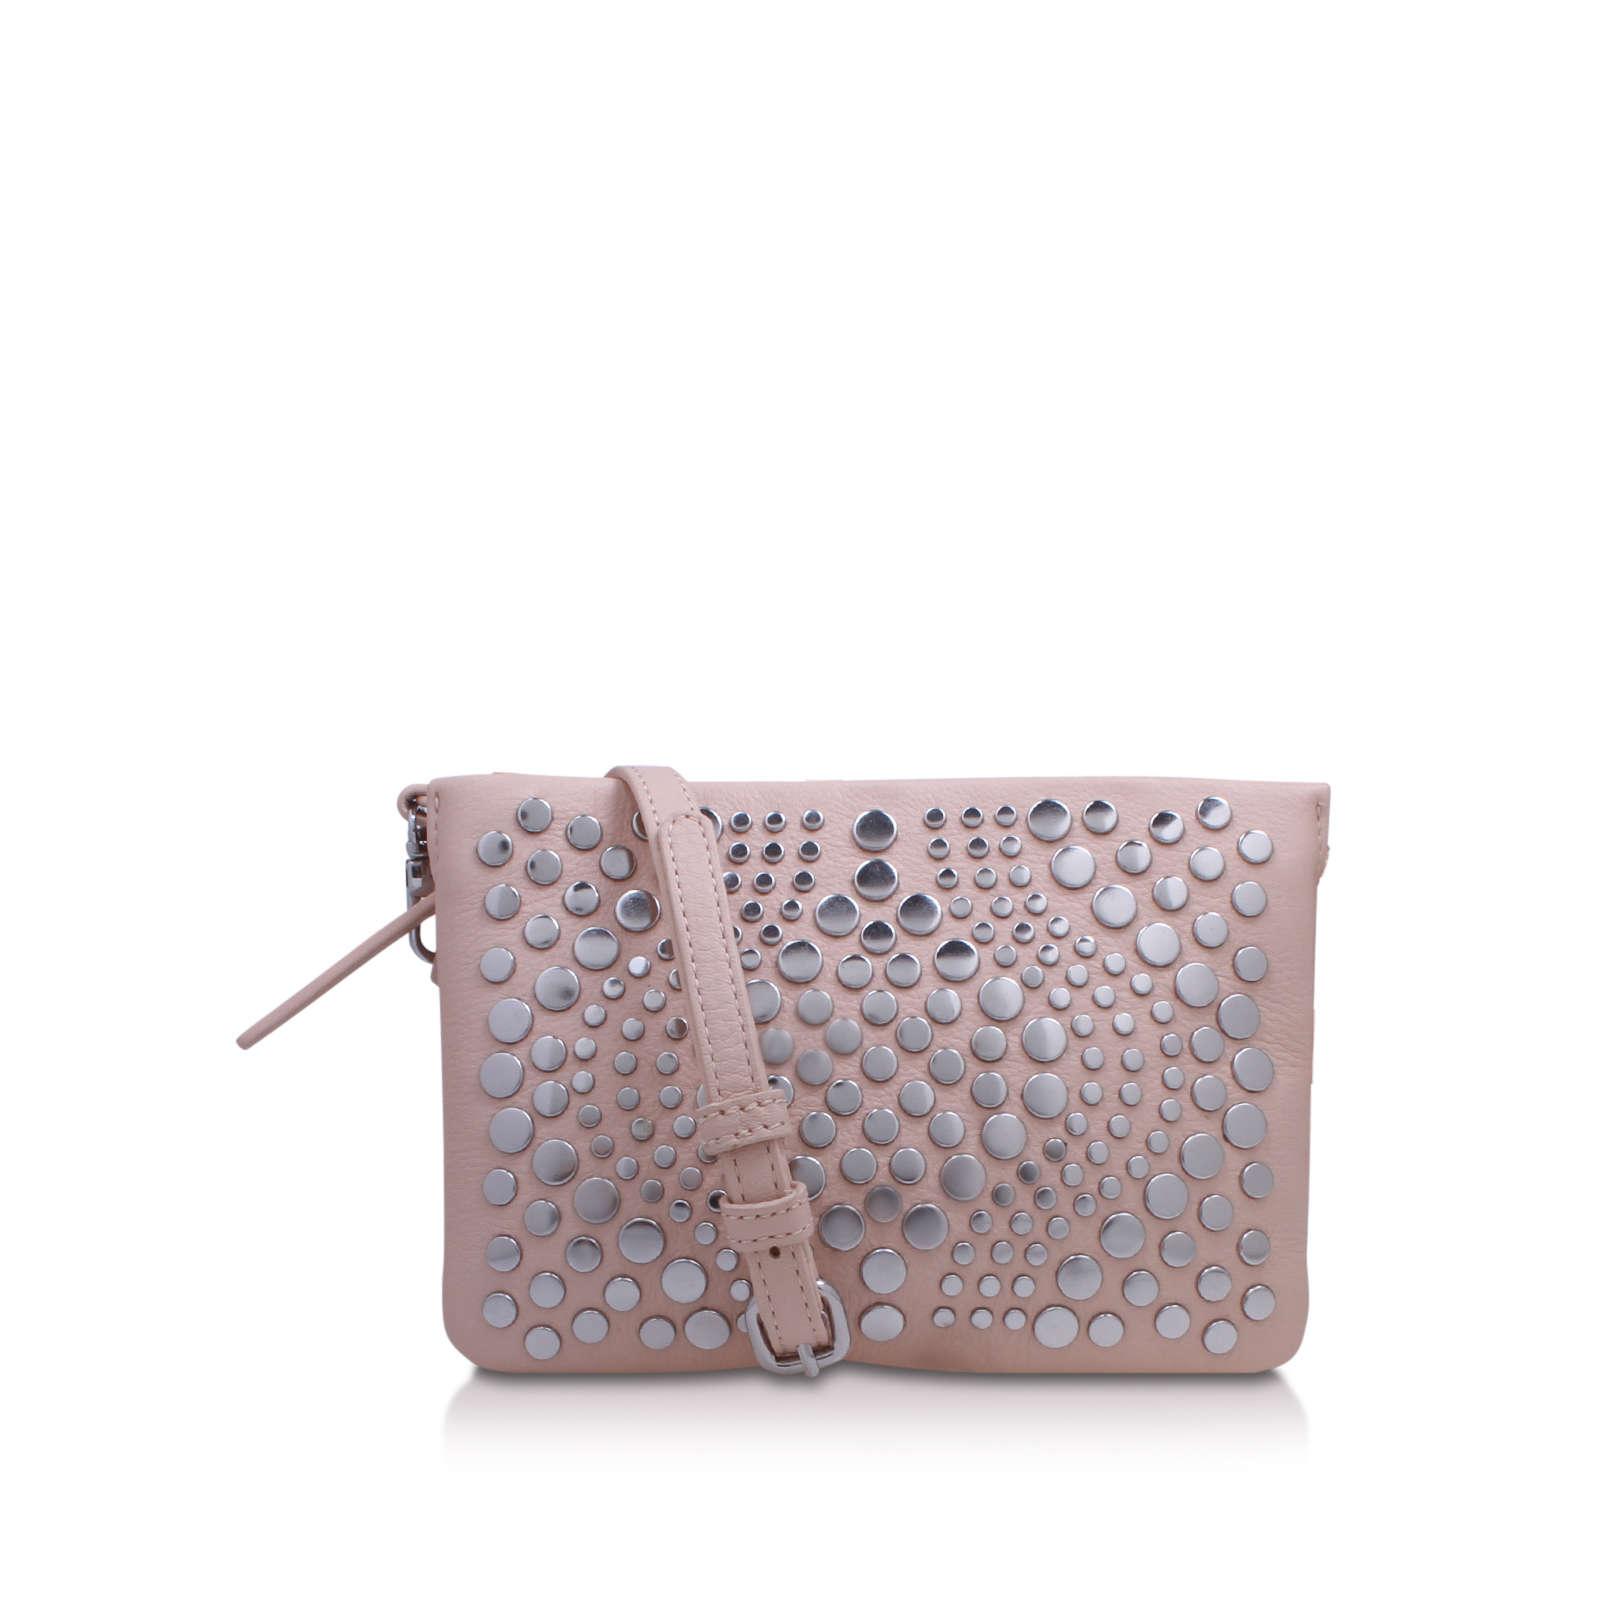 275de3619b2348 BONNY SMALL CROSSBODY Vince Camuto Bonny Small Crossbody Pale Pink Leather  Handbag by VINCE CAMUTO